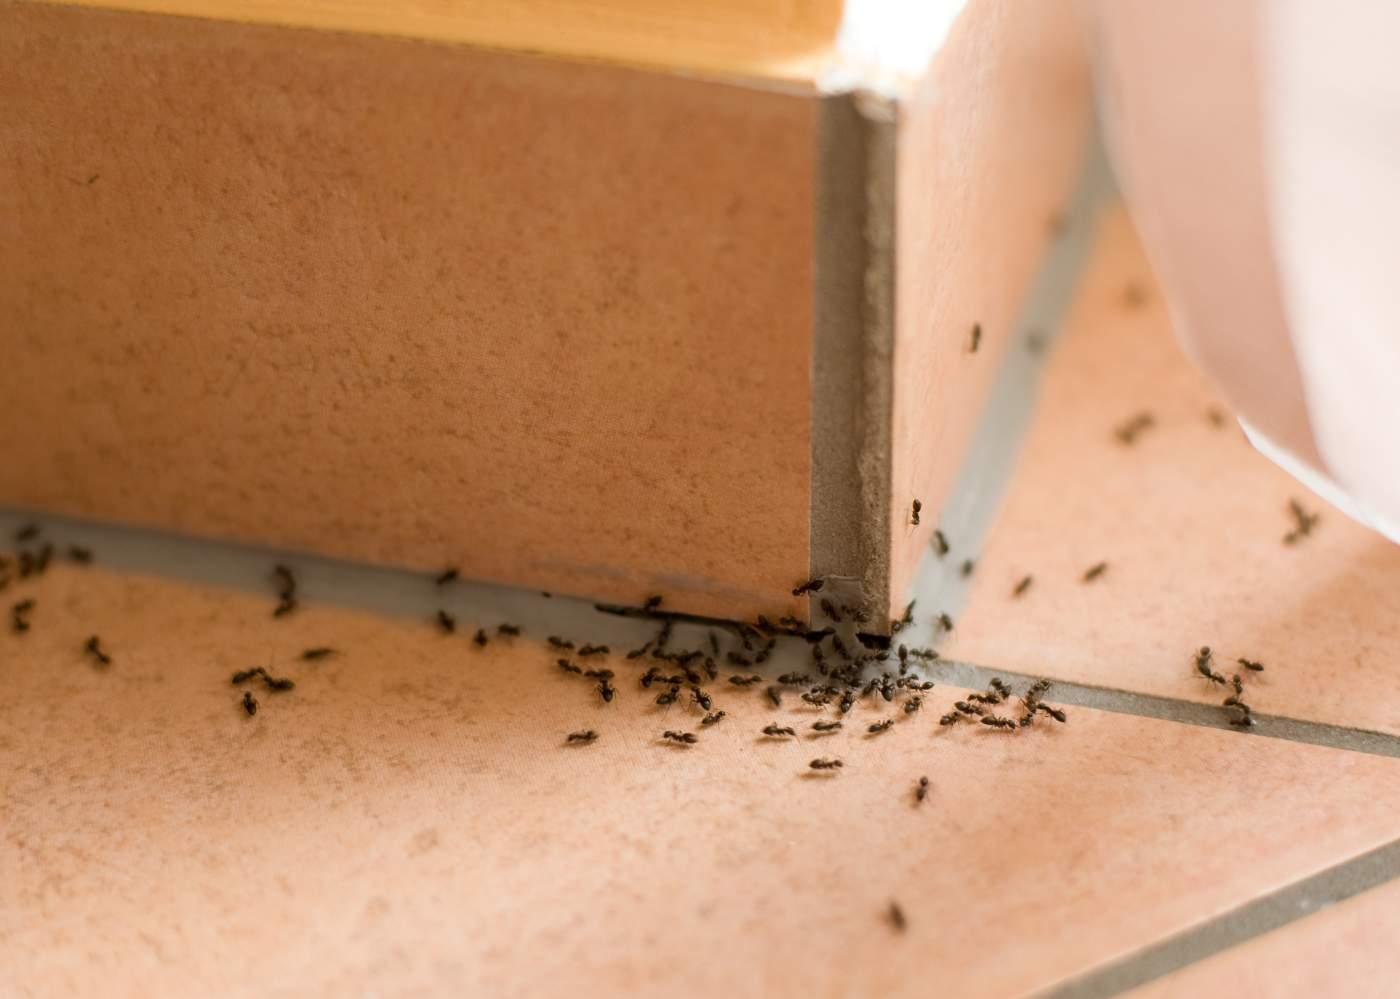 ant problems pest control services, manchester